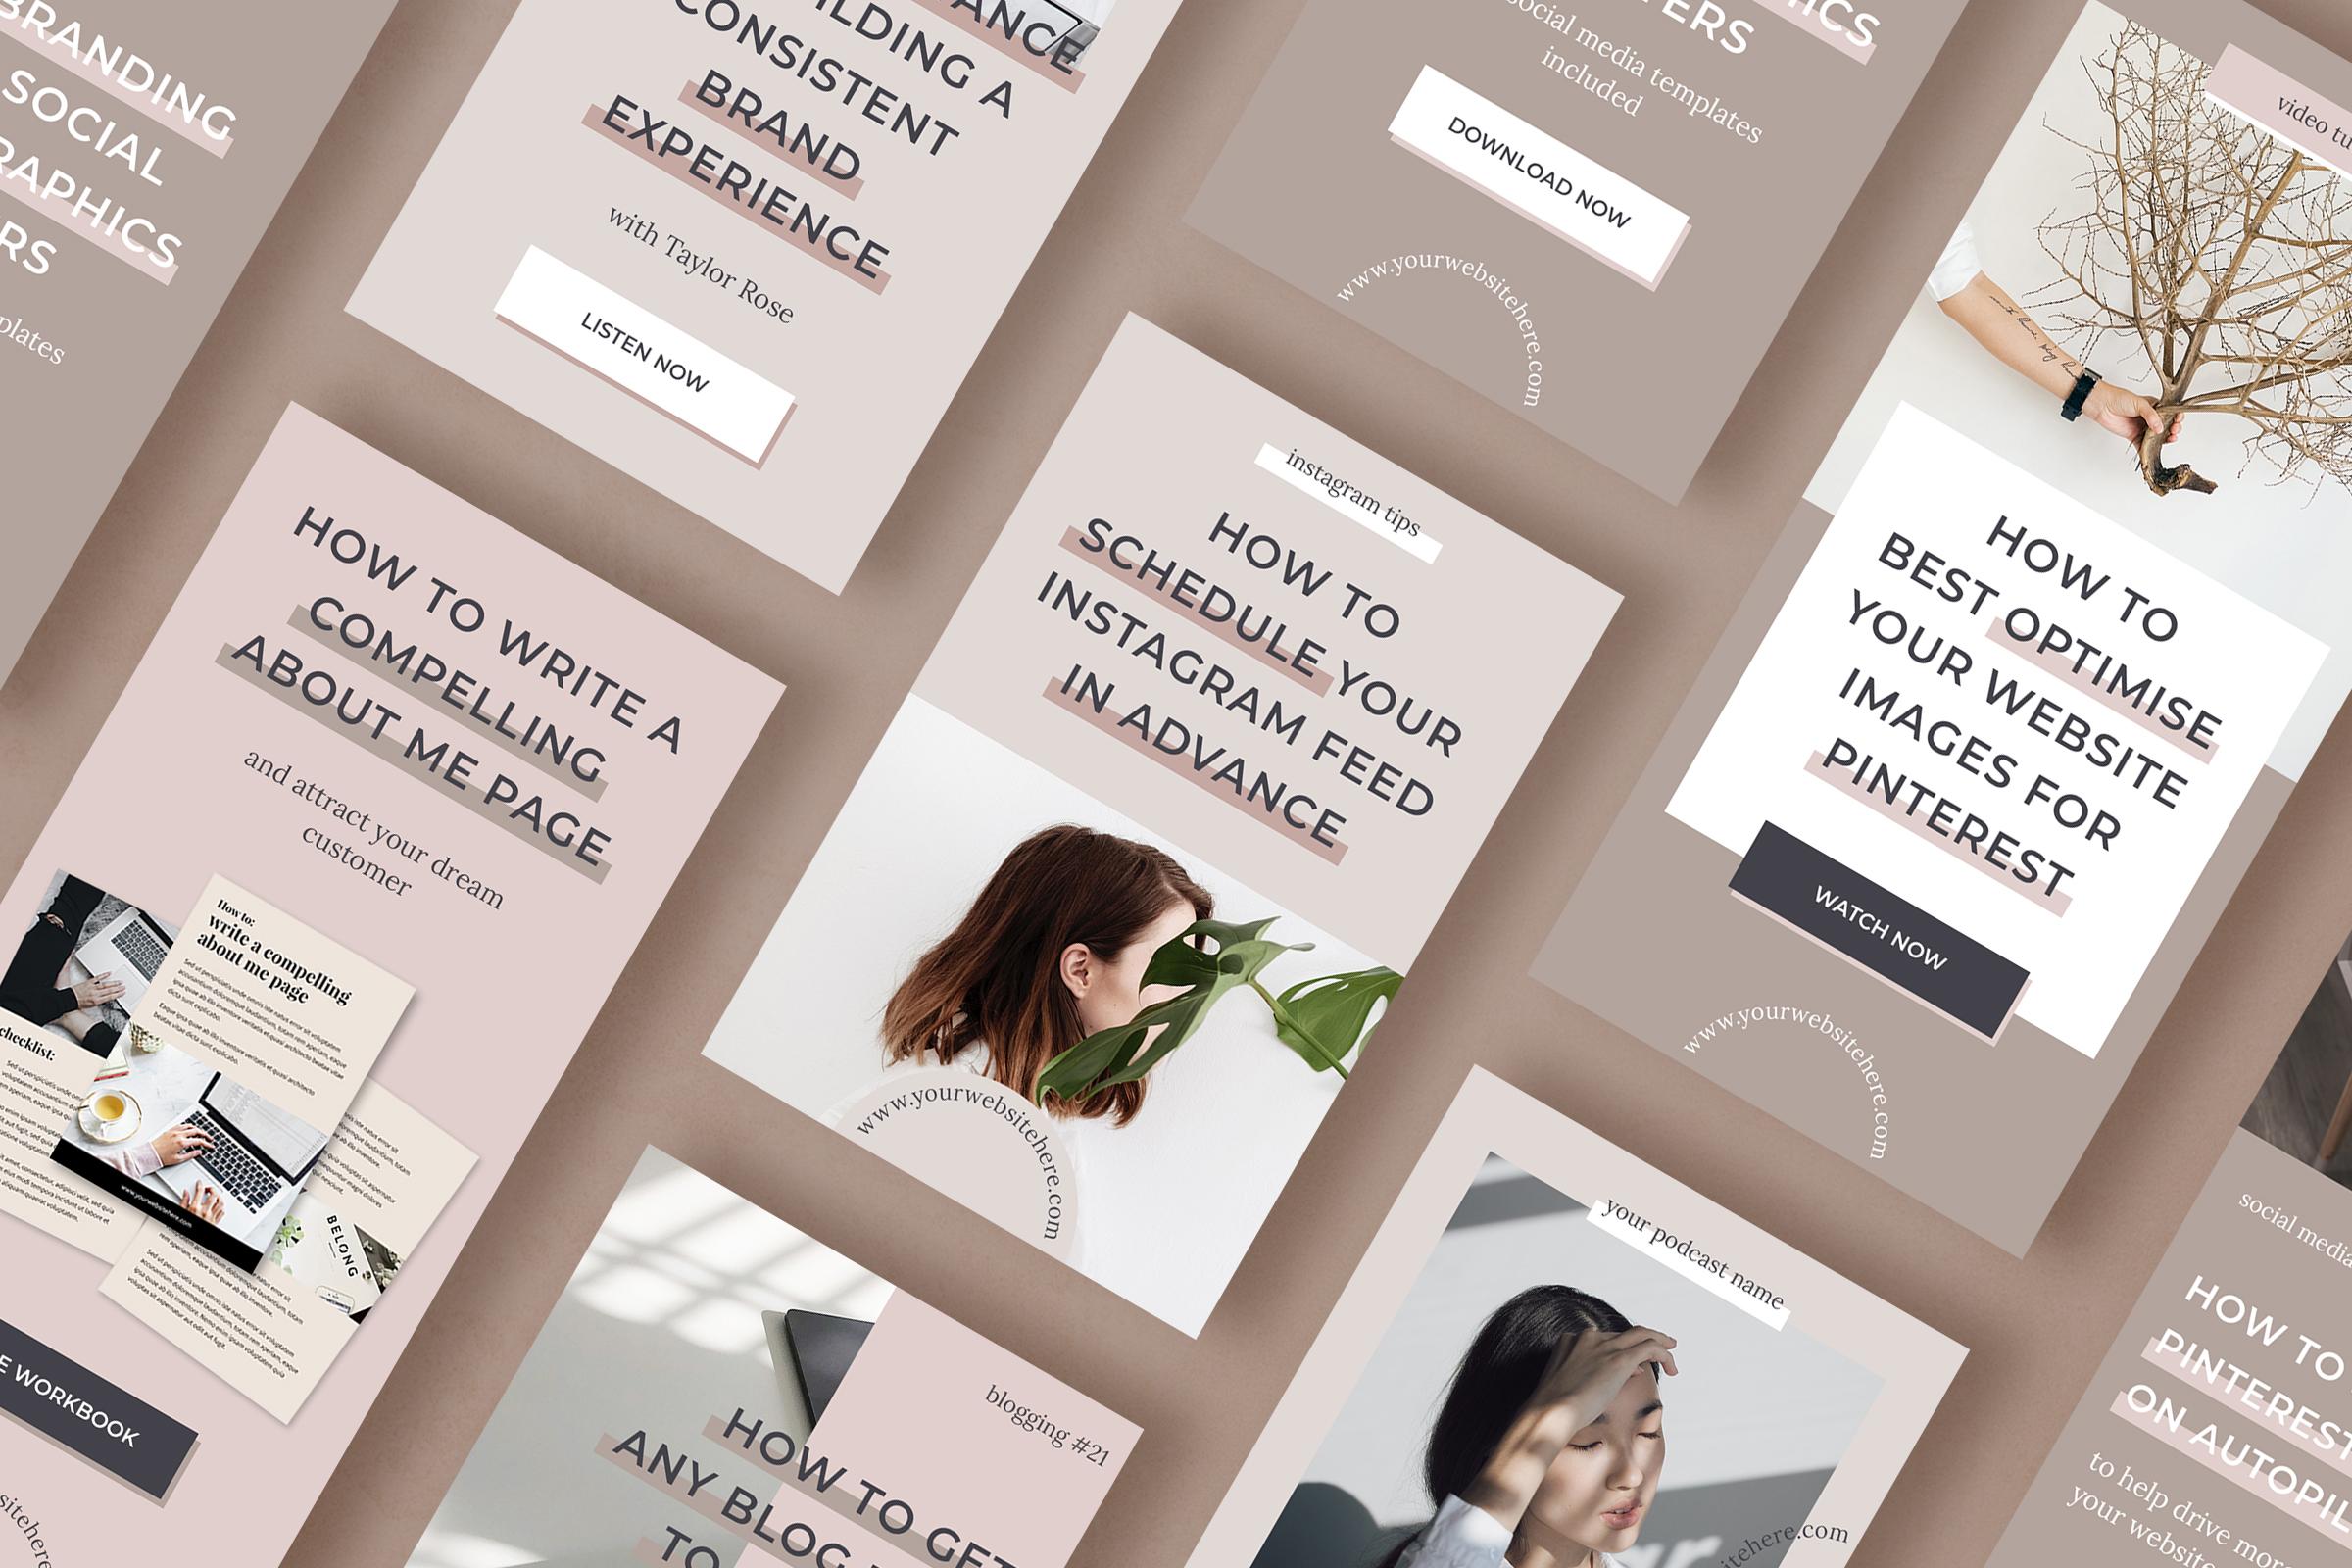 Infopreneur social media marketing bundle for bloggers example image 3